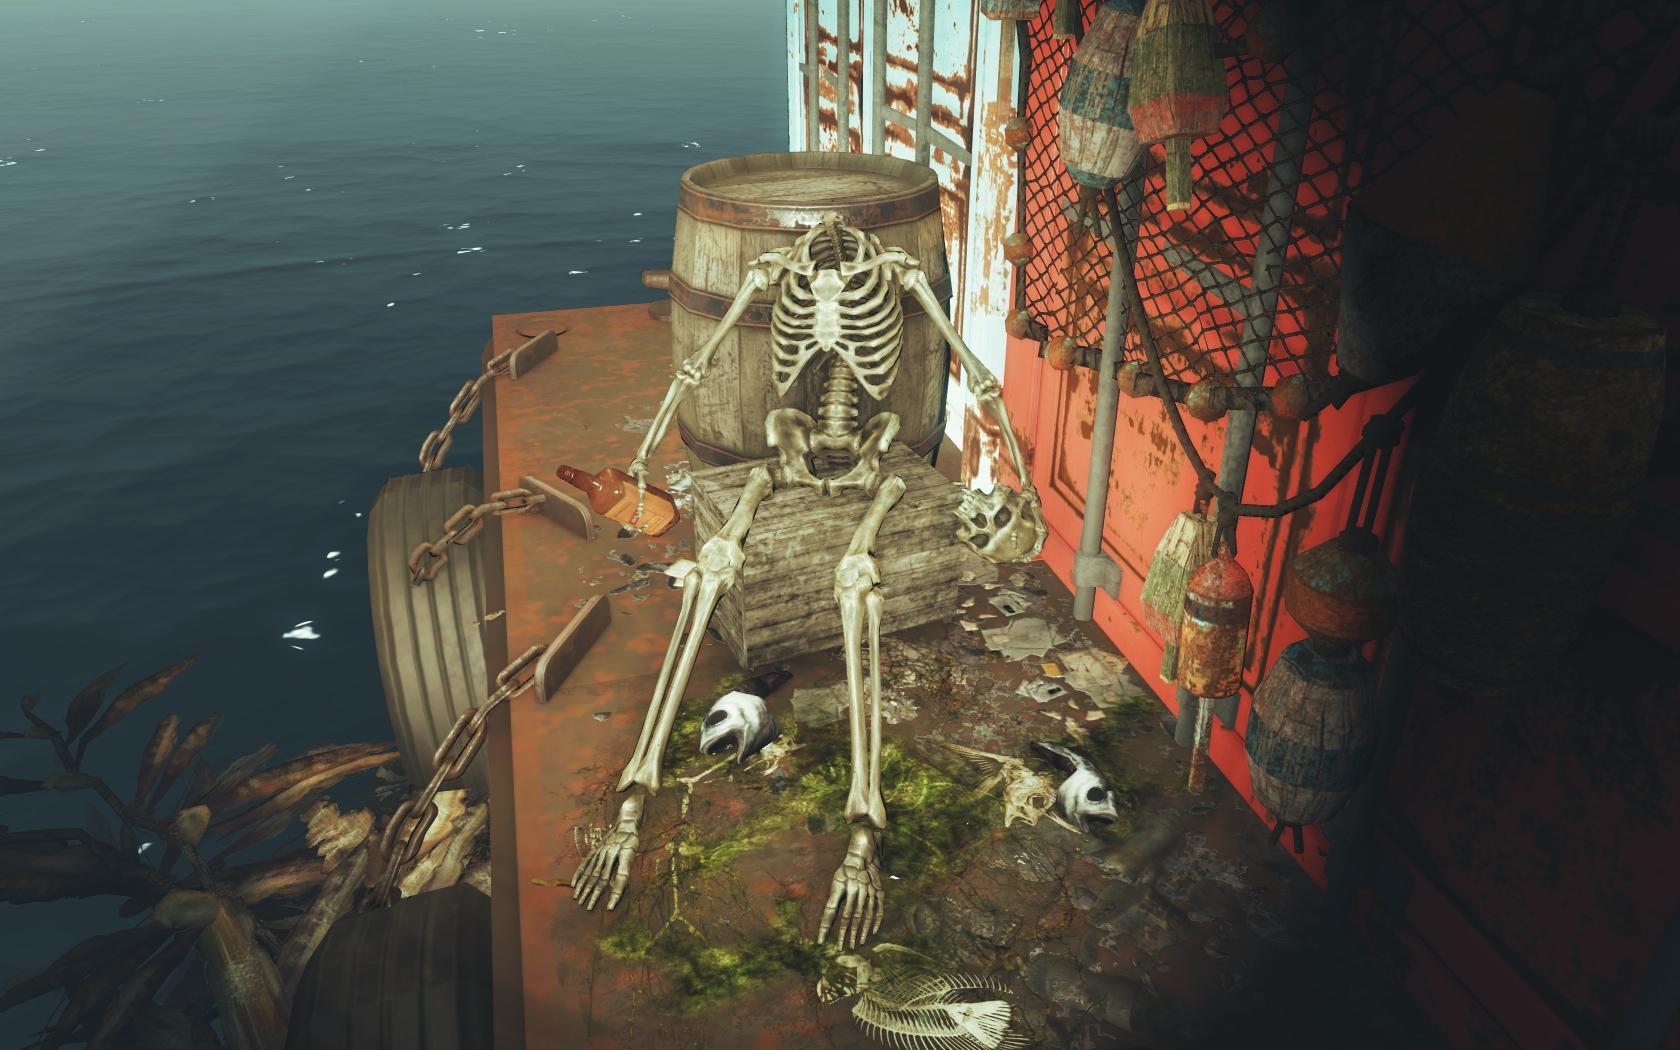 Сказ о вреде алкоголя (Фар-Харбор, Азалия) - Fallout 4 Азалия, скелет, юмор